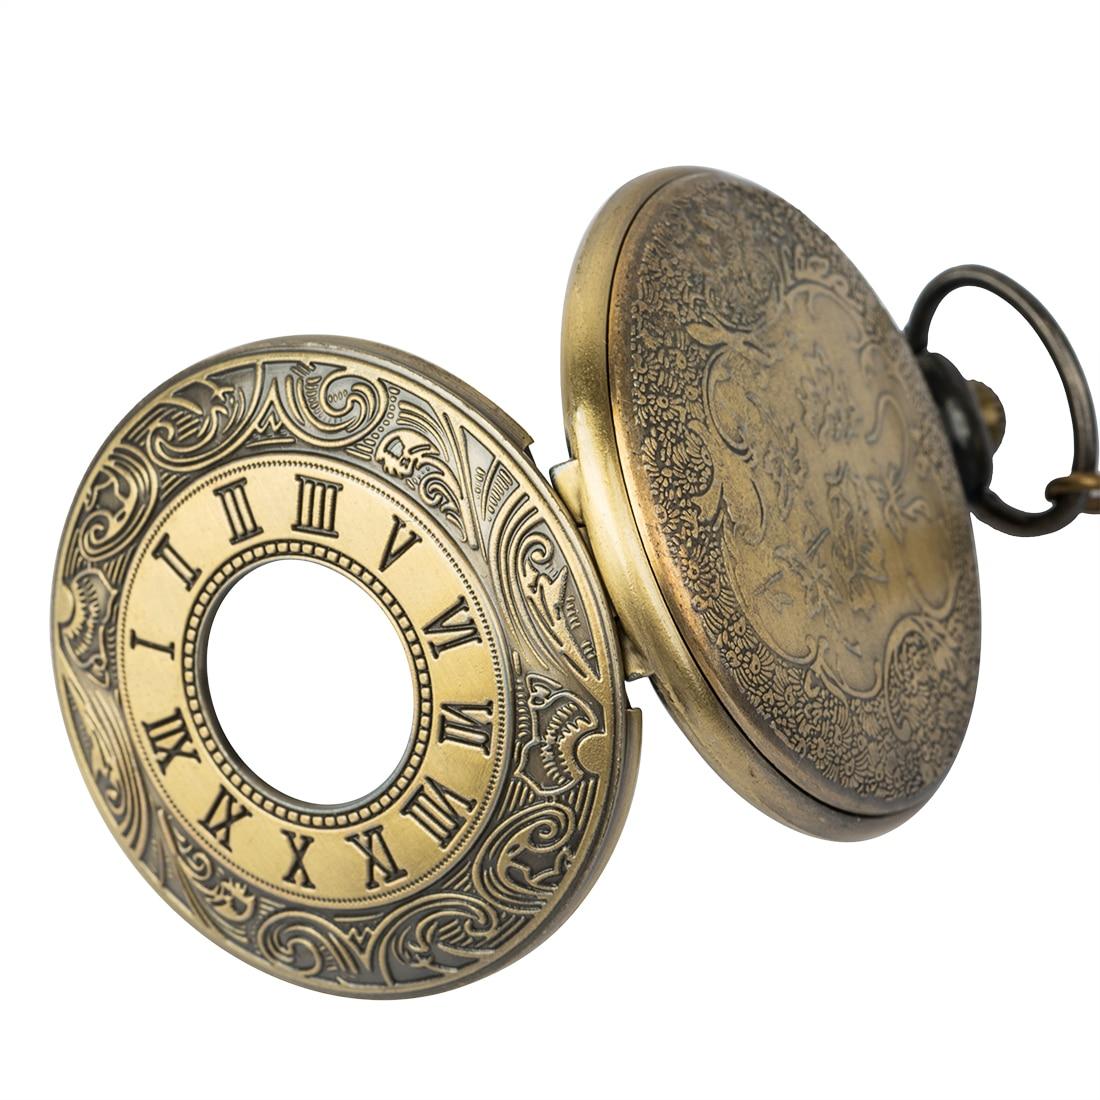 1Pcs Unisex Vintage Hollow Carved Roman Numerals Case Mechanical Pocket Watch Gift fullmetal alchemist Dragon watch